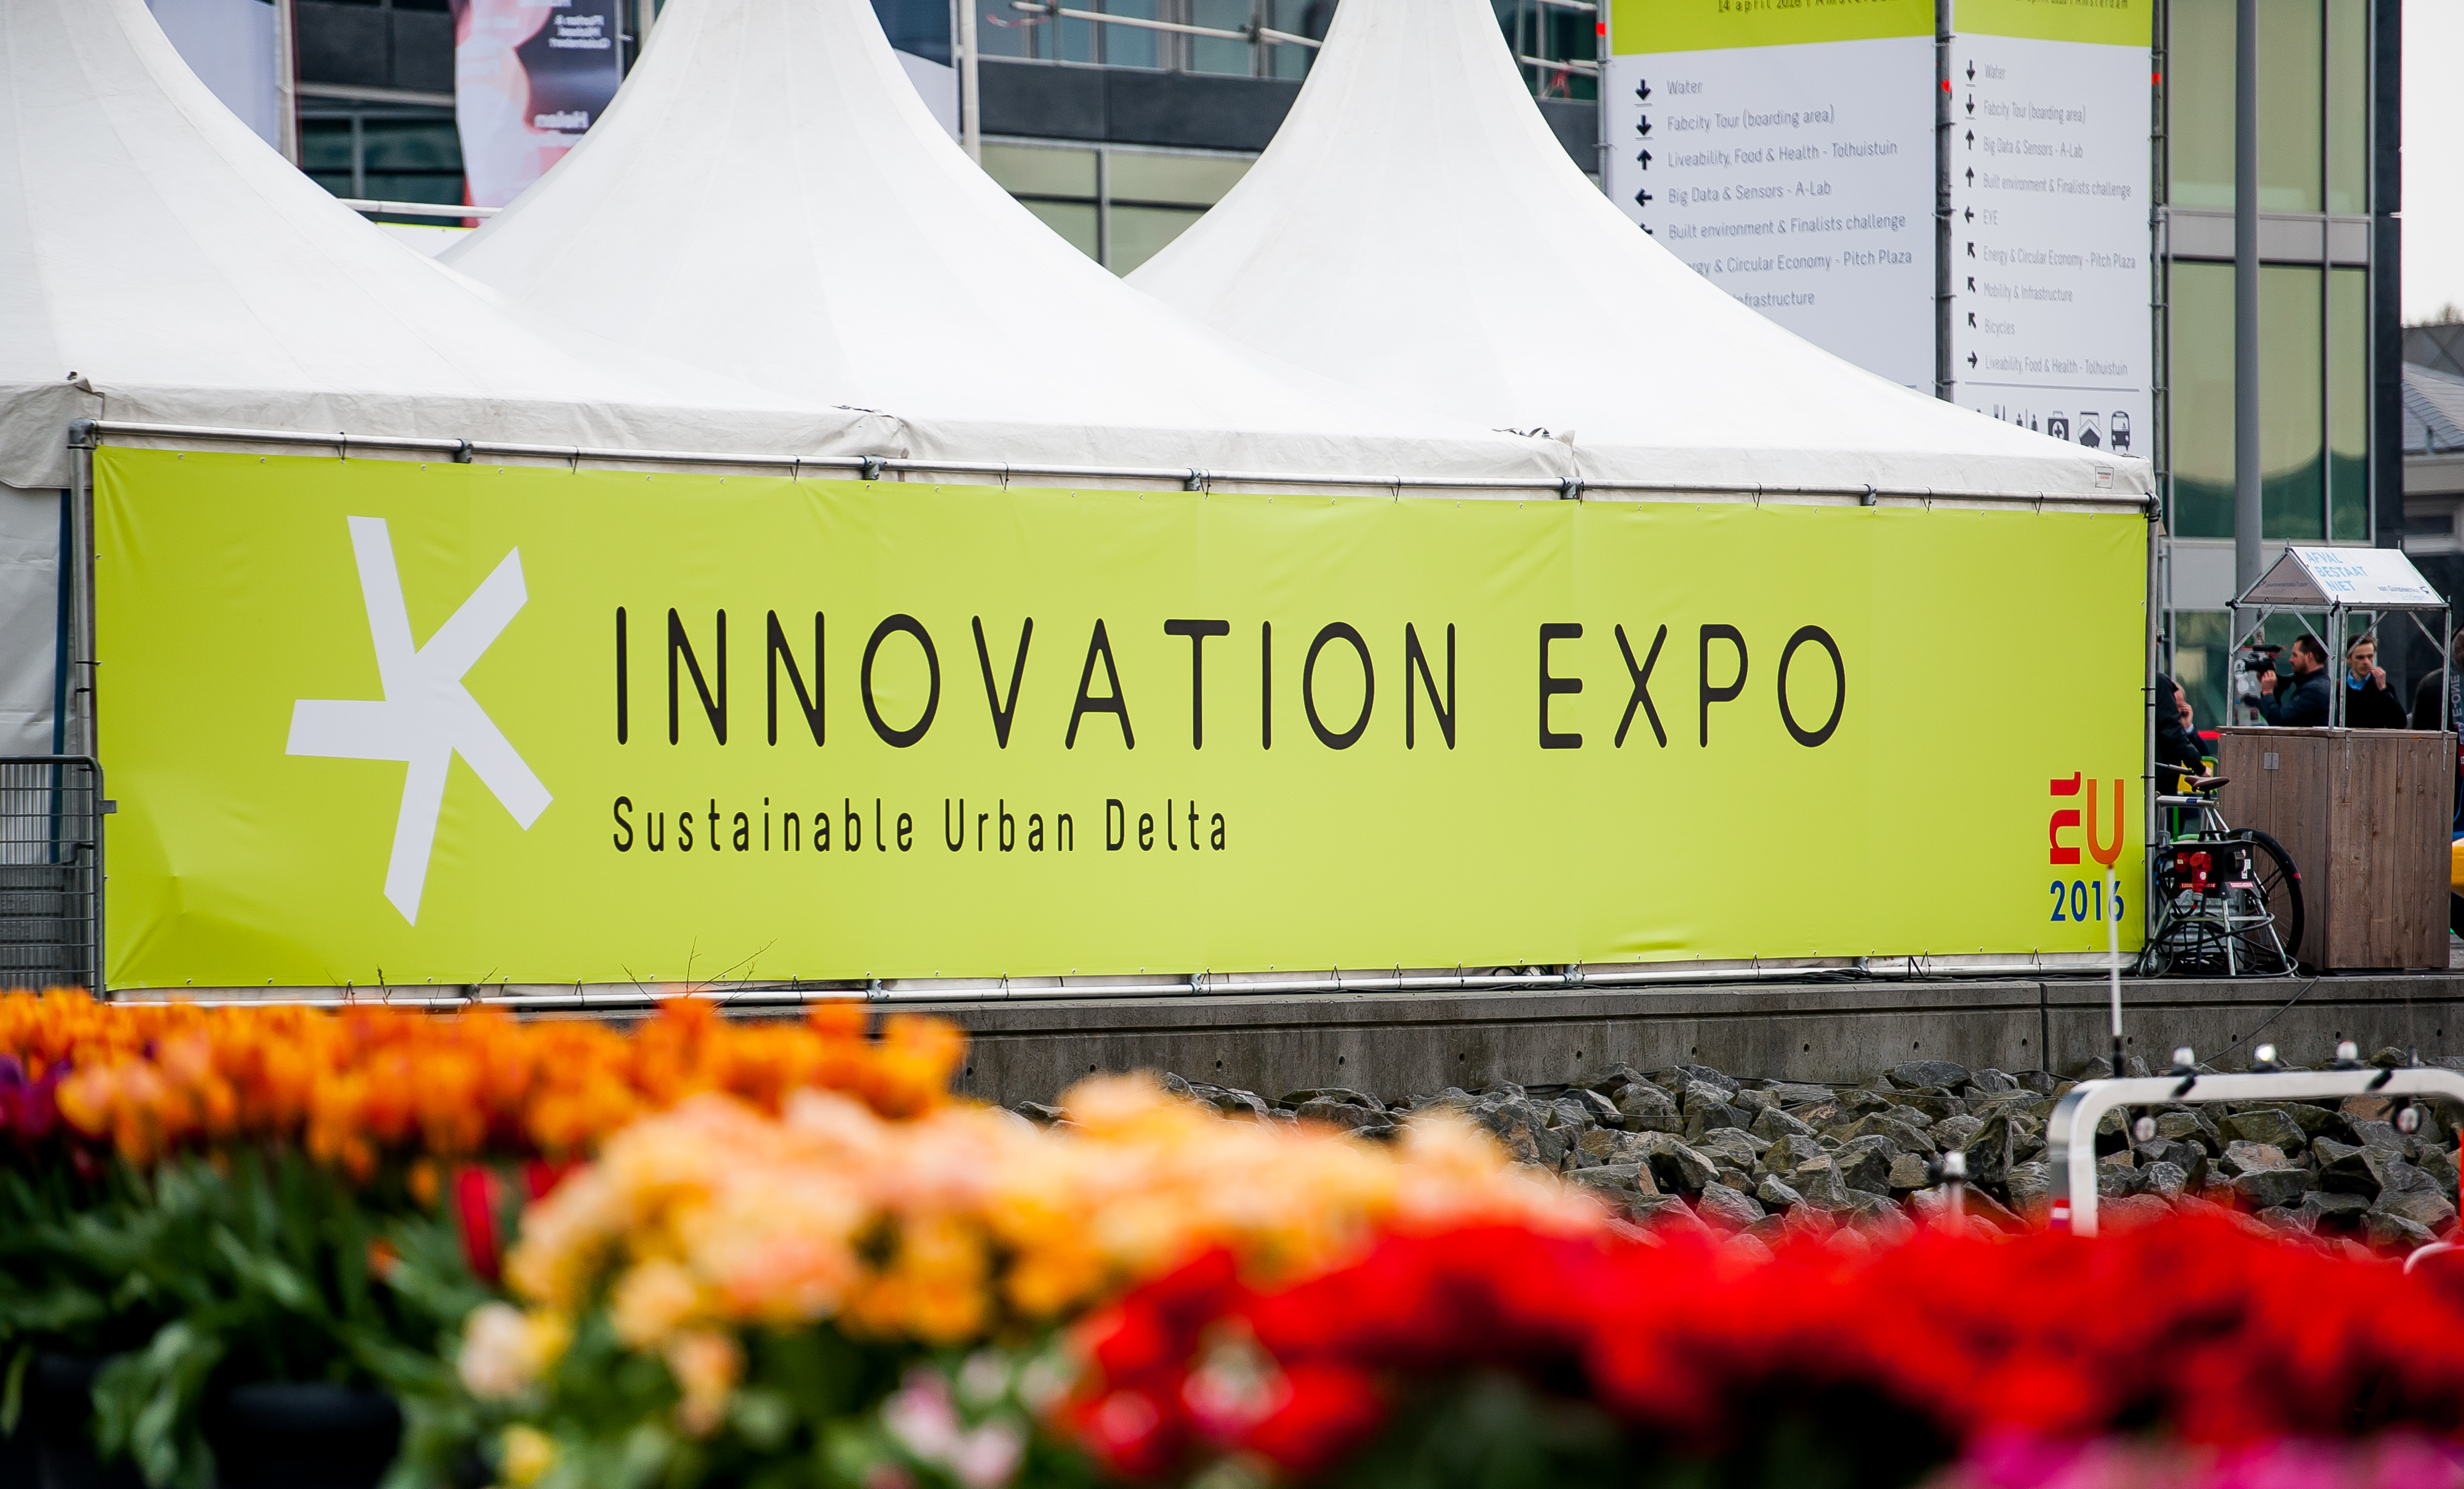 Innovation Expo Amsterdam